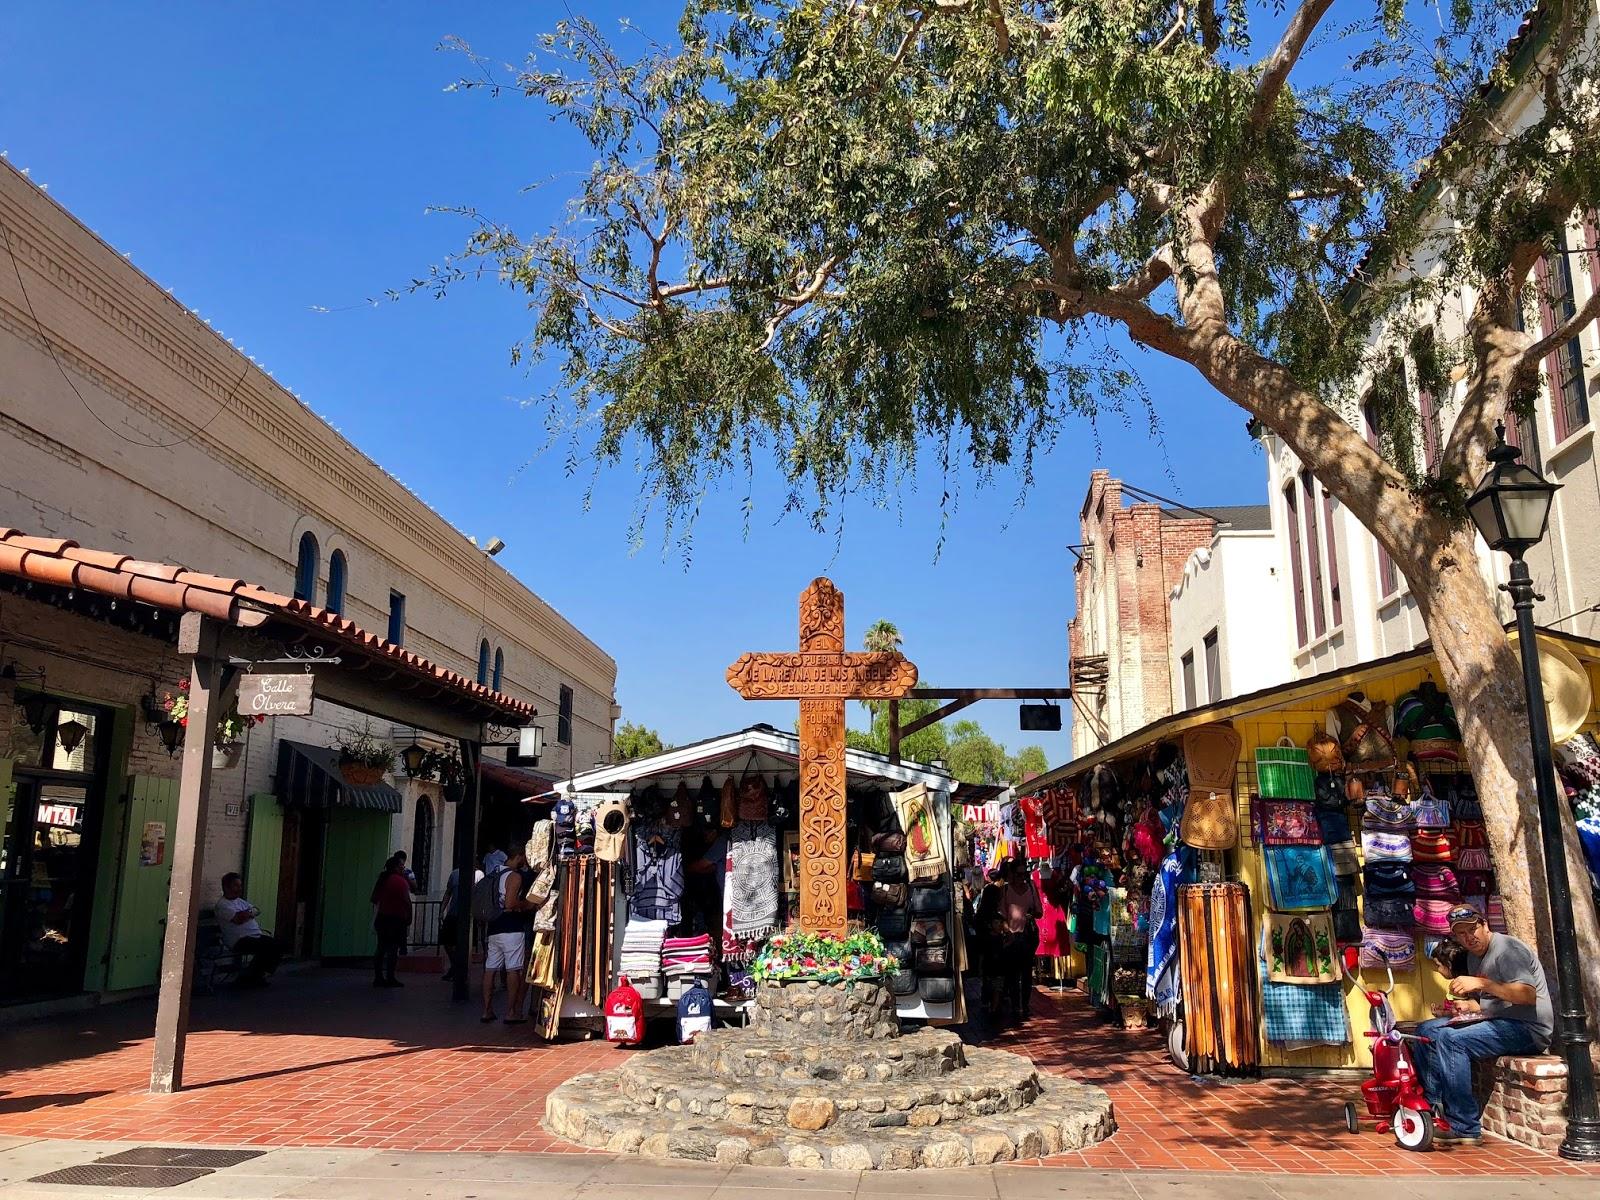 Olvera Street Entrance - Life in Wanderlust